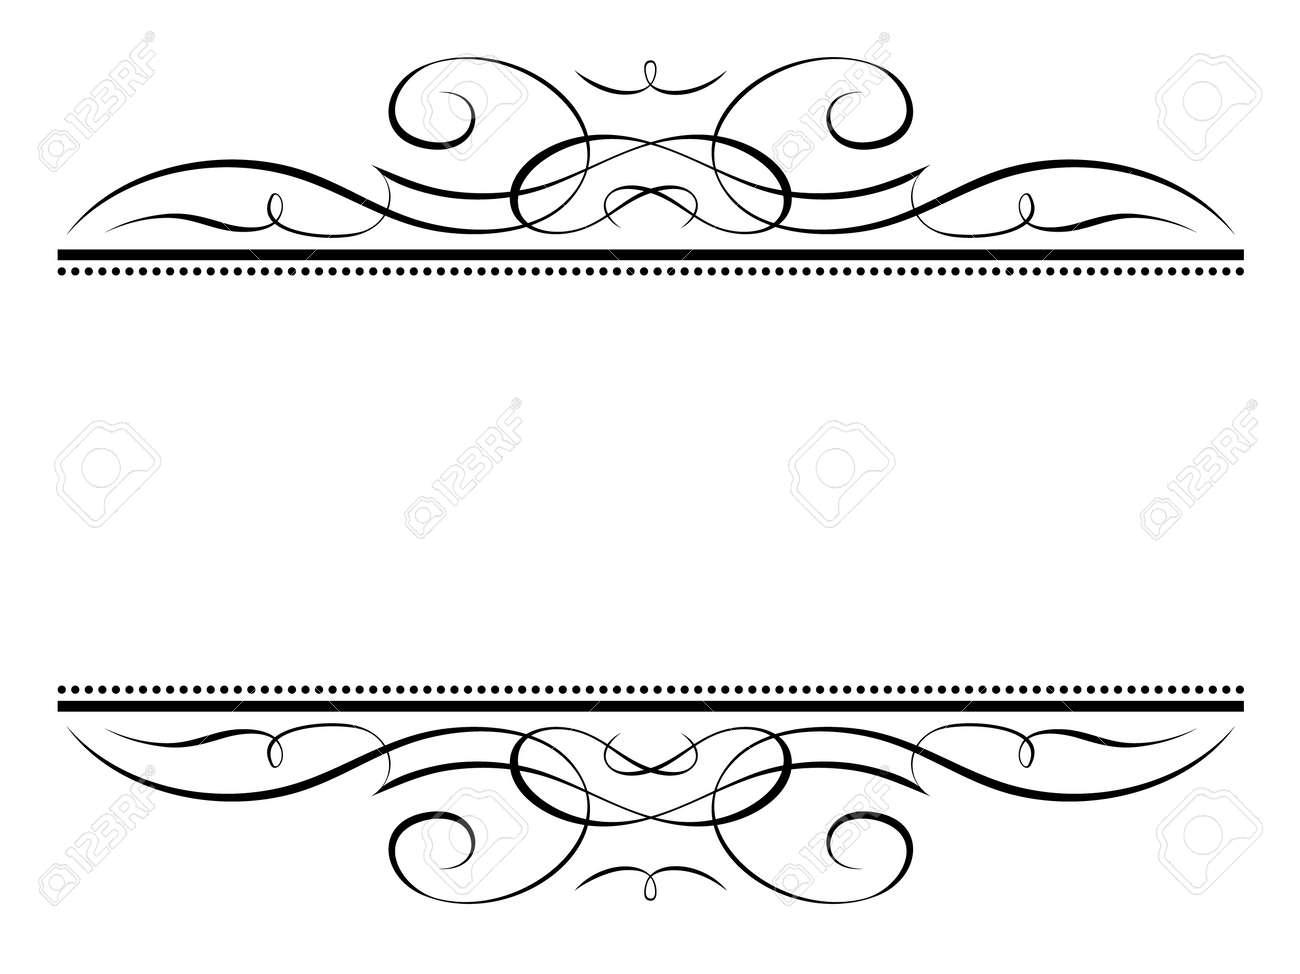 Vector calligraphy vignette ornamental penmanship decorative frame Stock Vector - 12375402